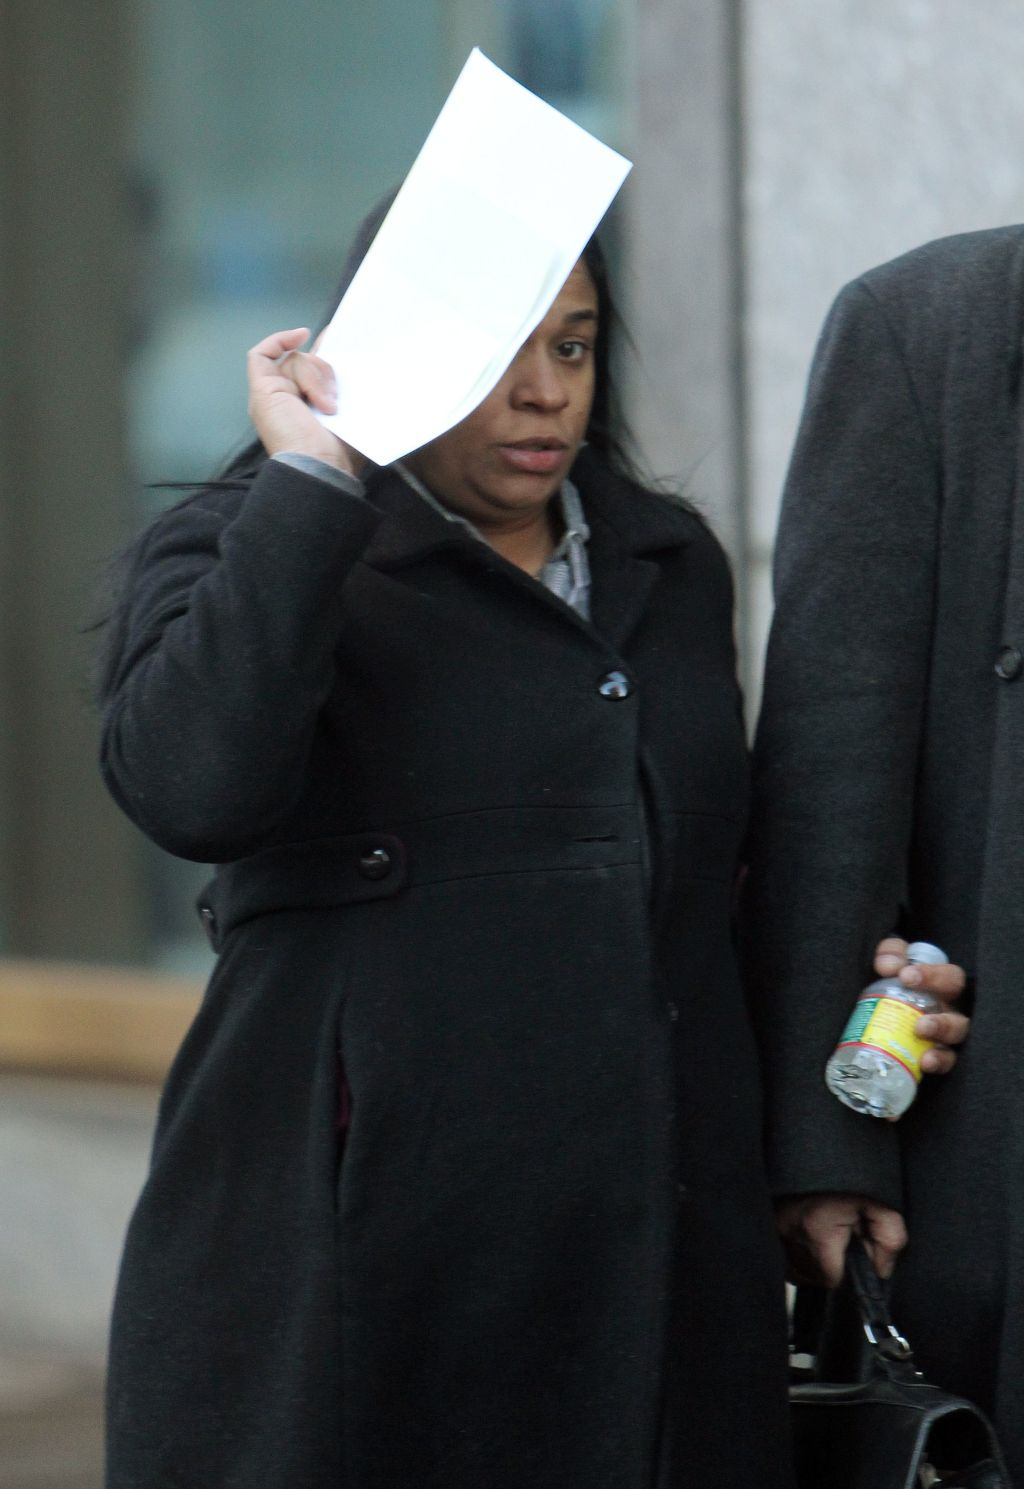 Whalesca Castillo, butt injections, 2011 arrest